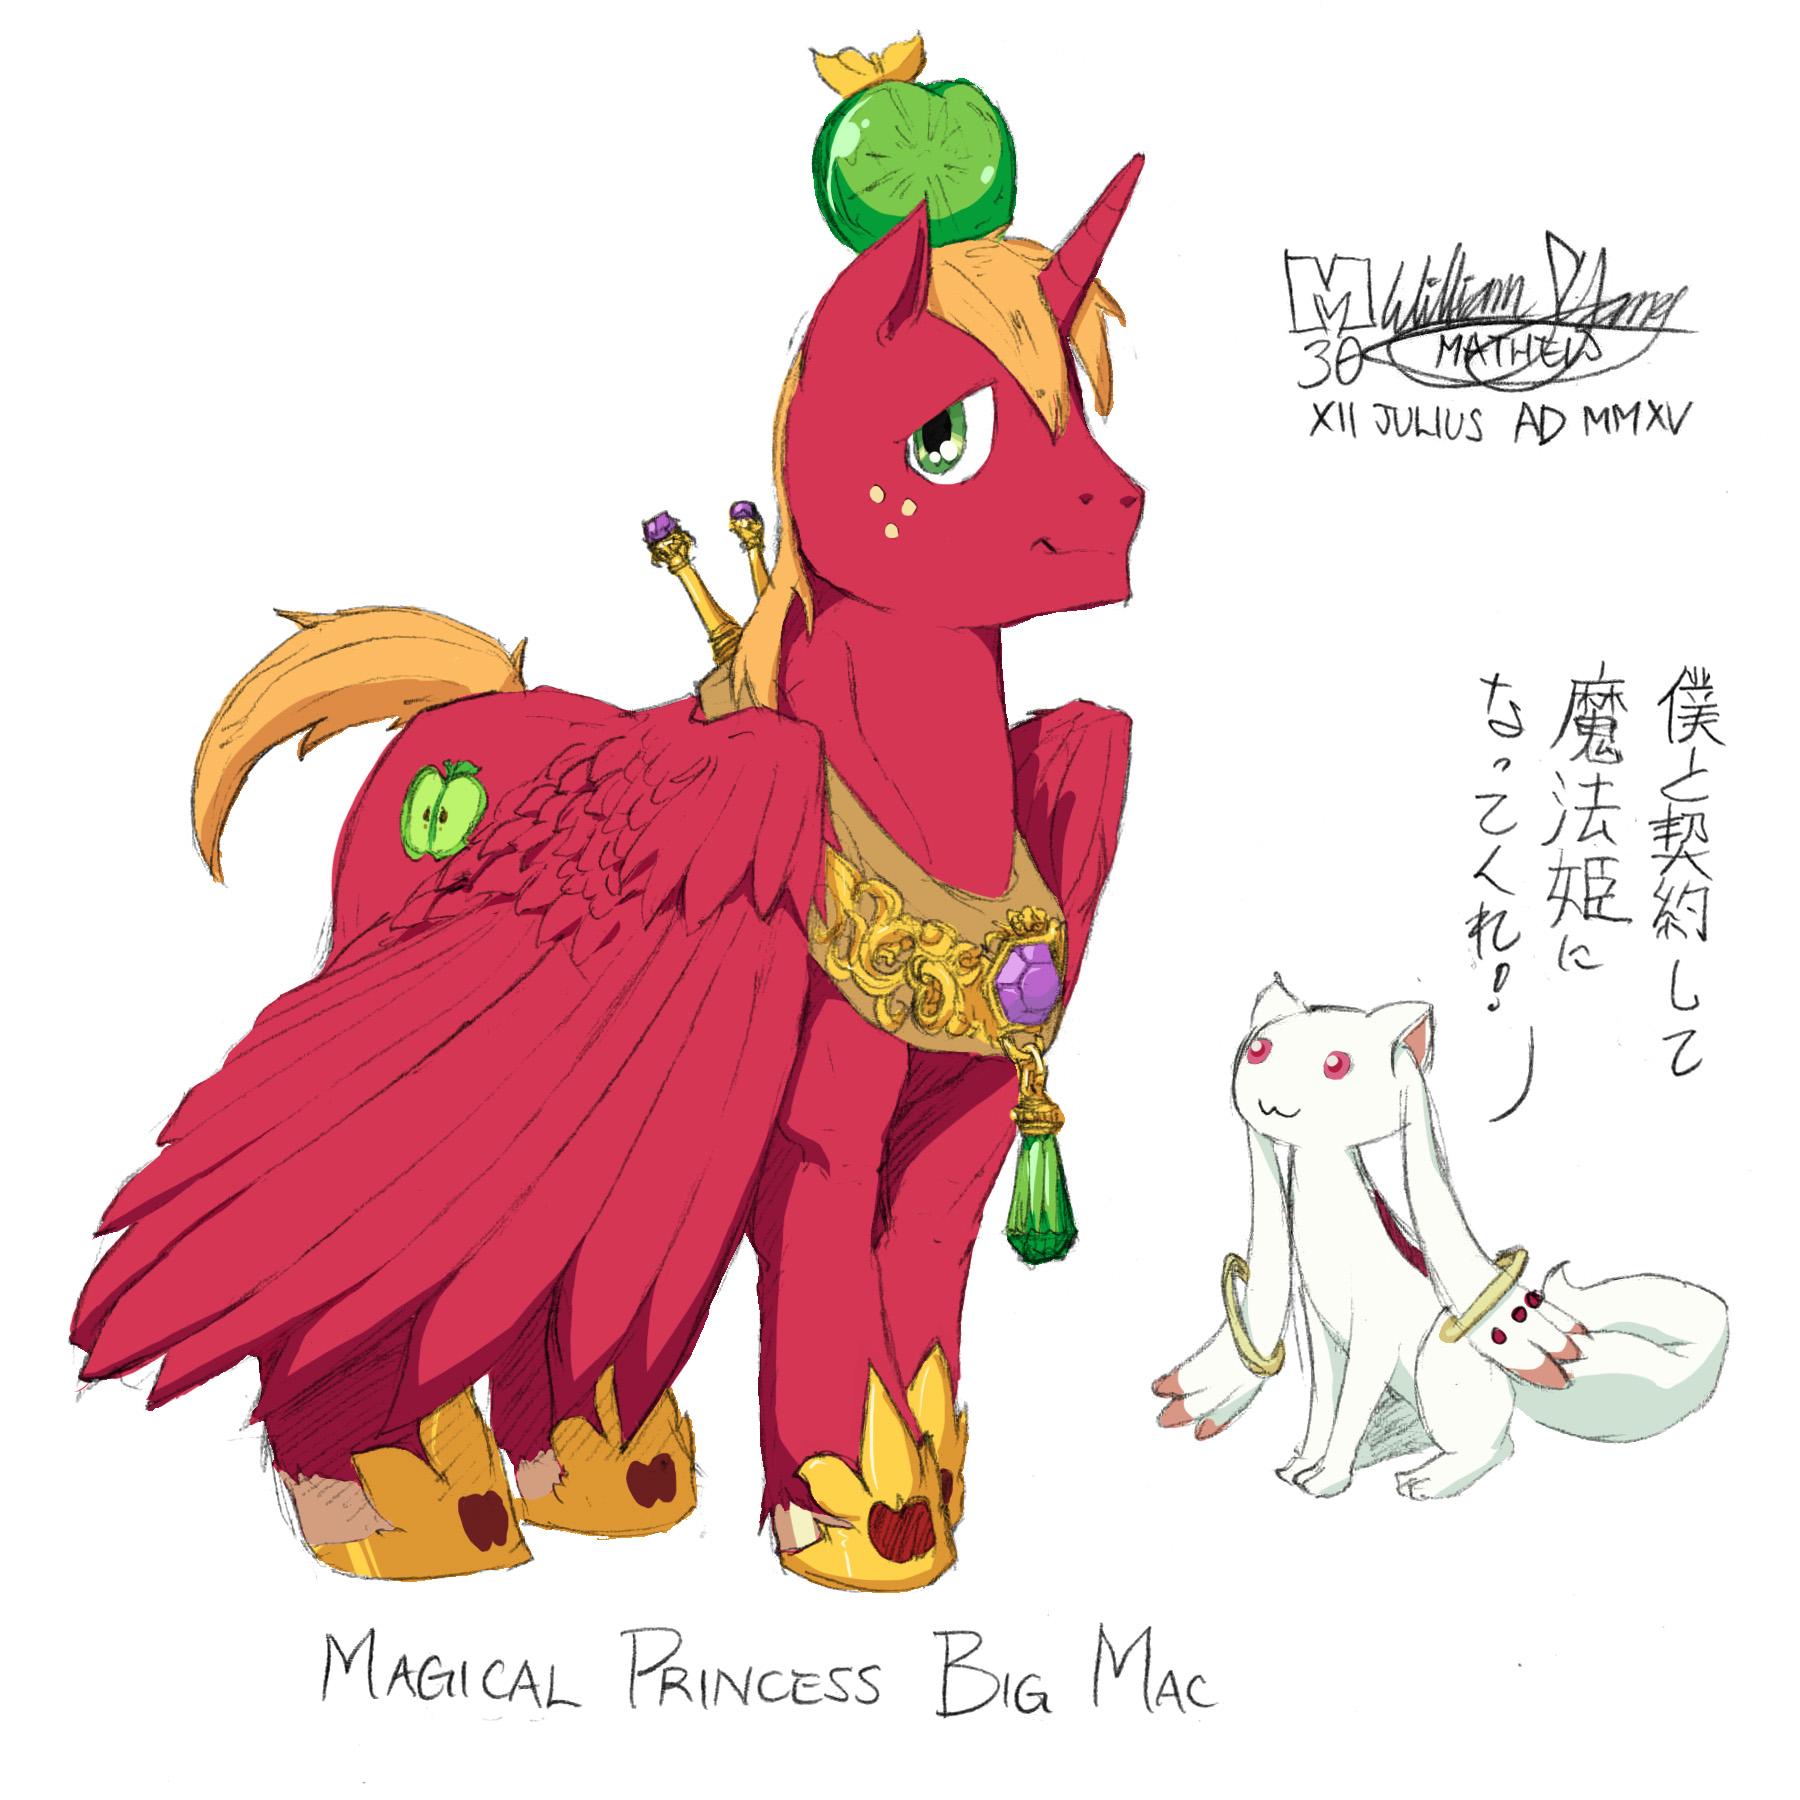 Magical Princess Big Mac Colour By Meto30 On Deviantart Princess Big Macintosh